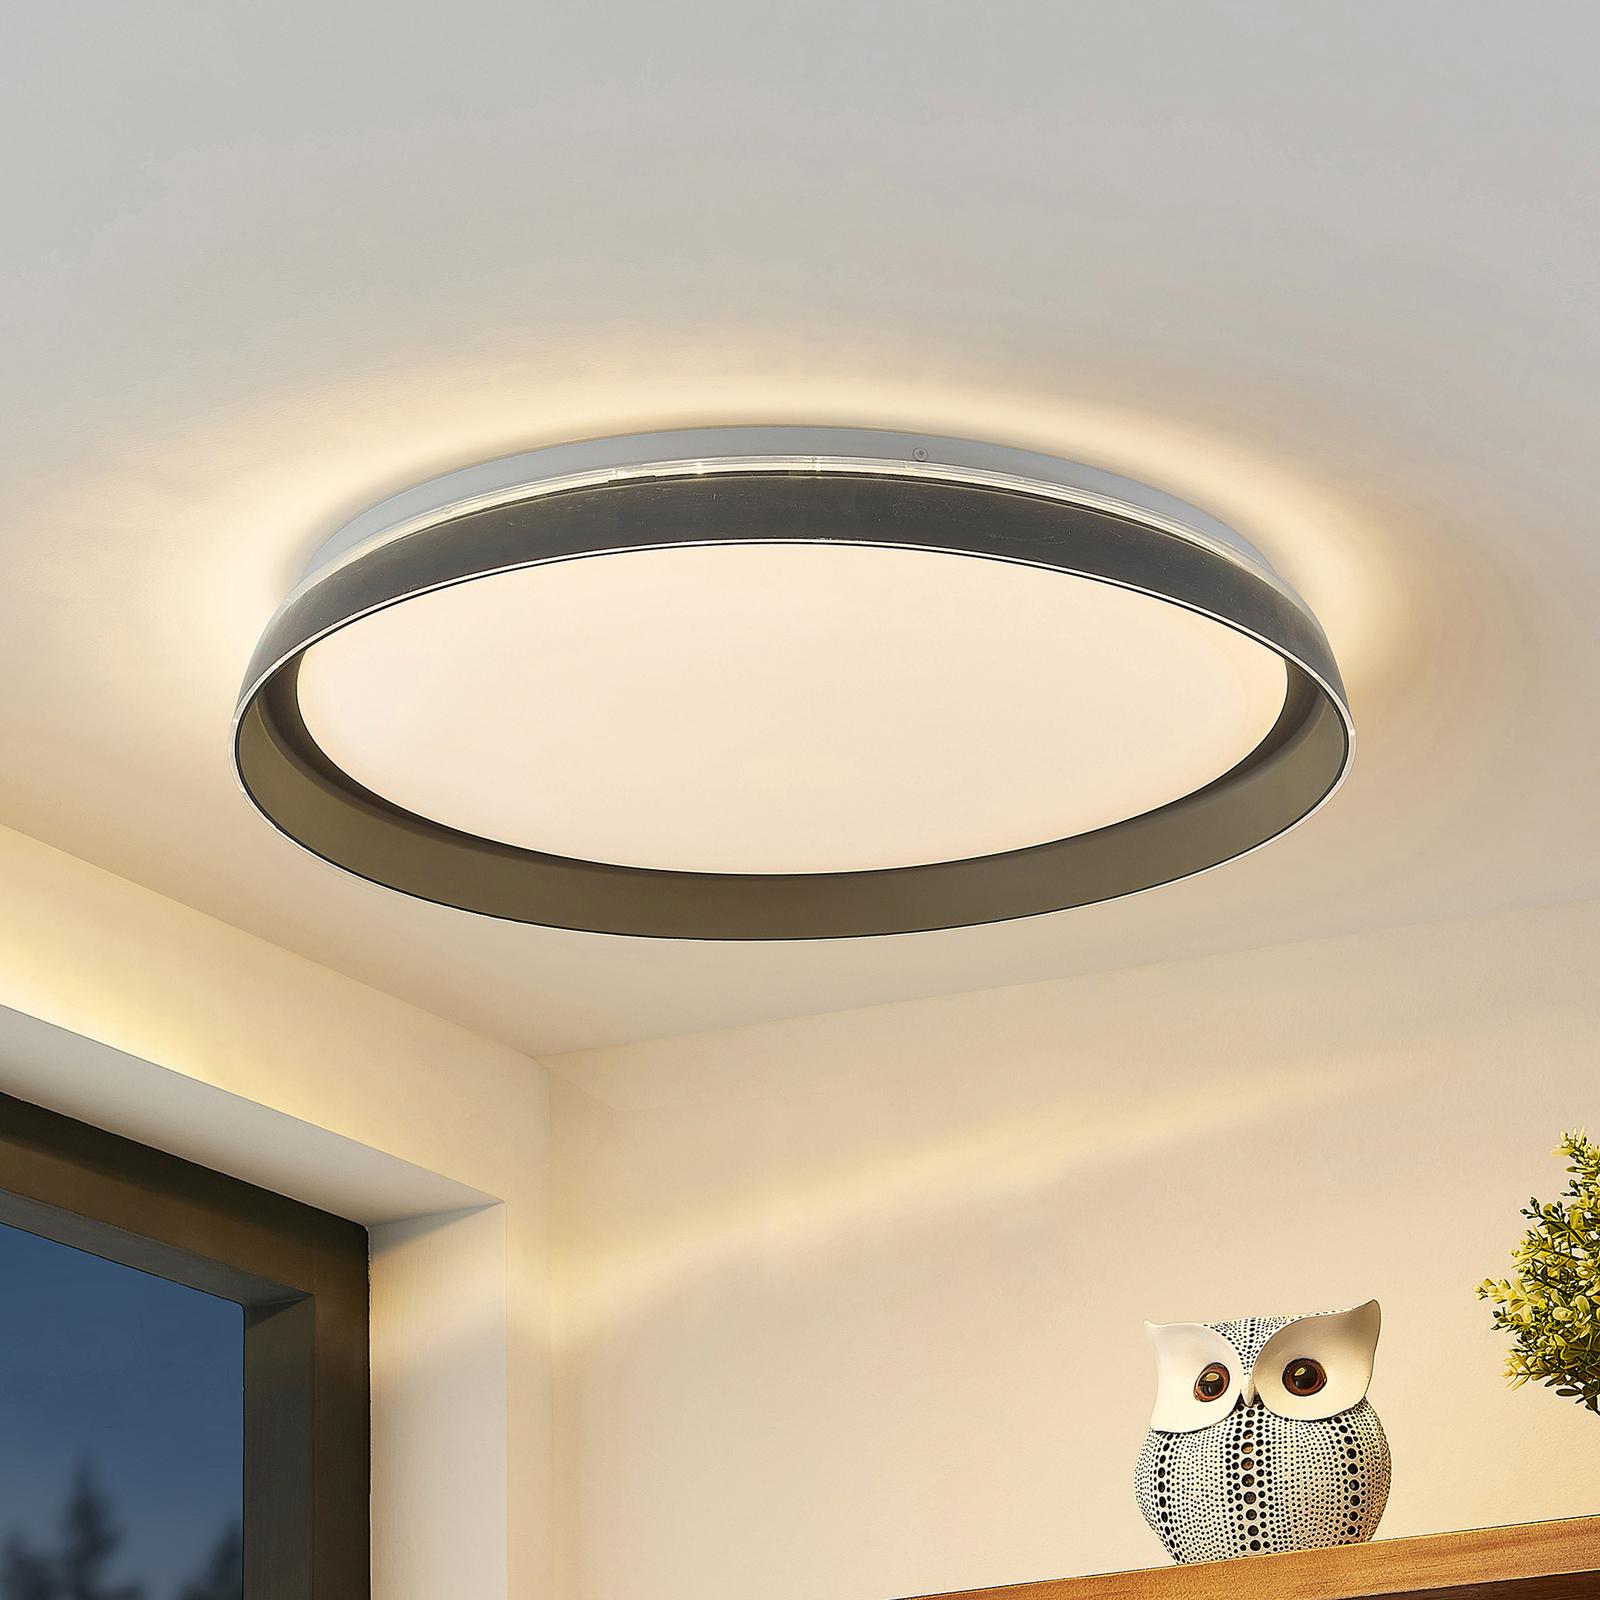 Lindby Kuvan LED-taklampe, CCT, dimbar